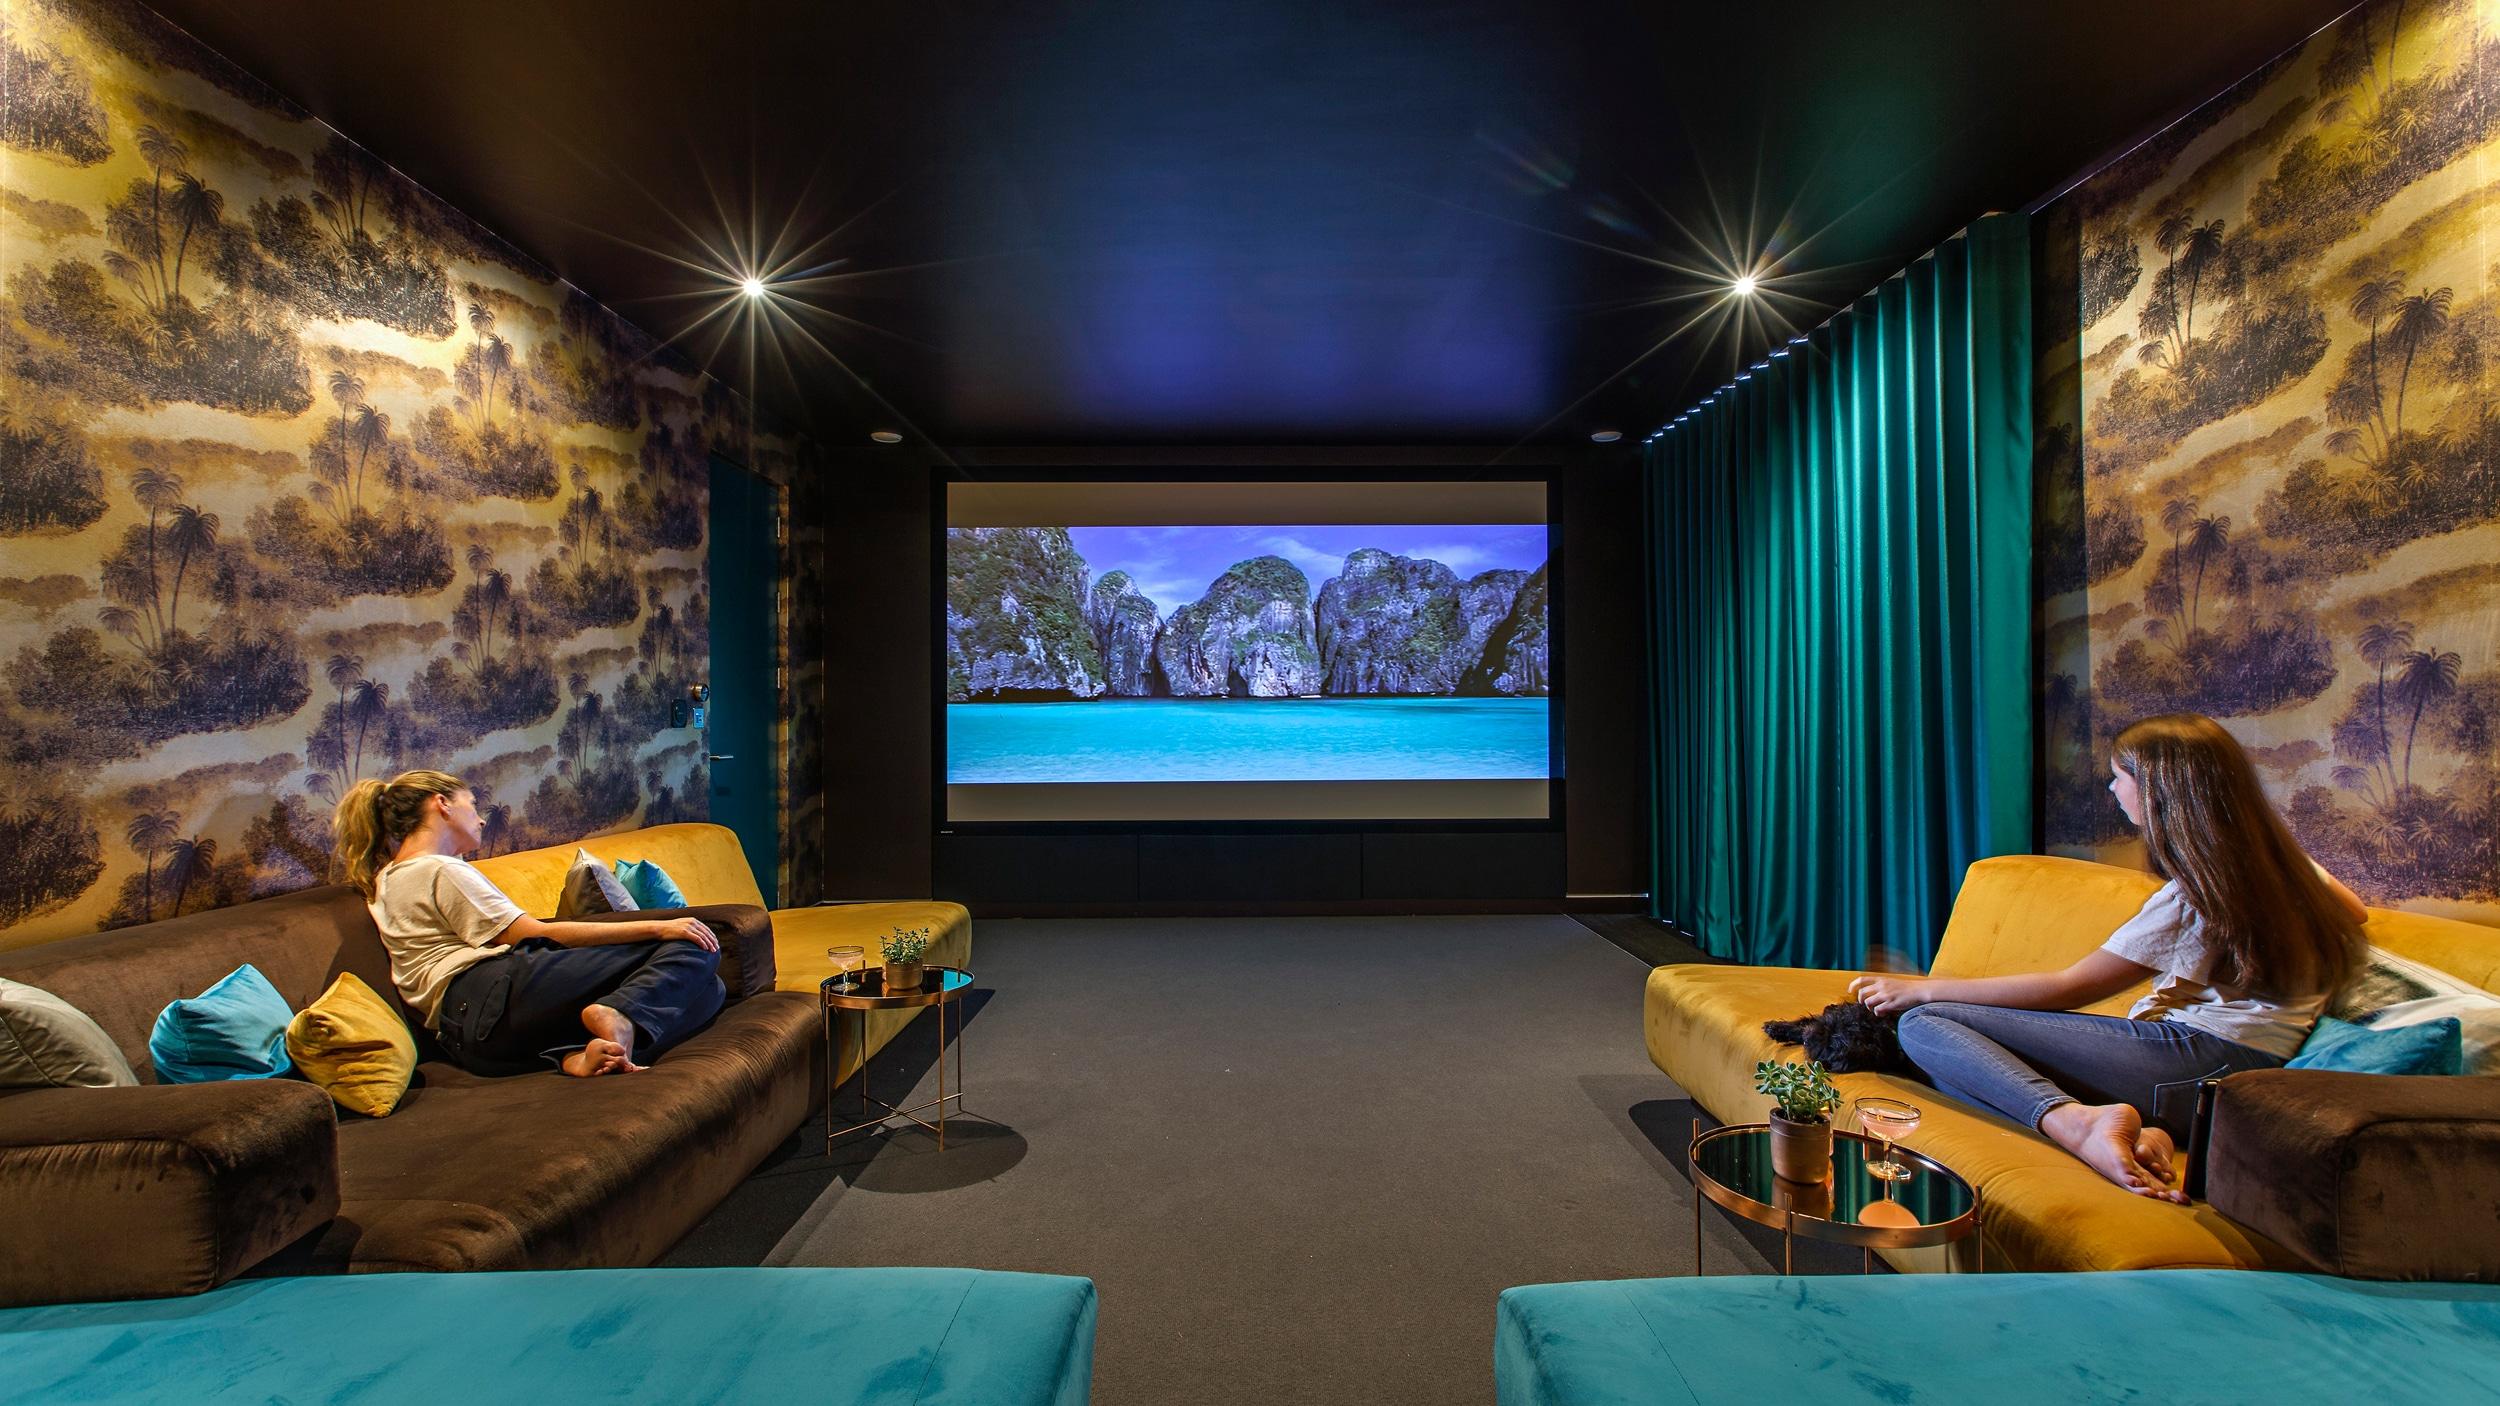 The Cinema Room at Bliss Blakeney